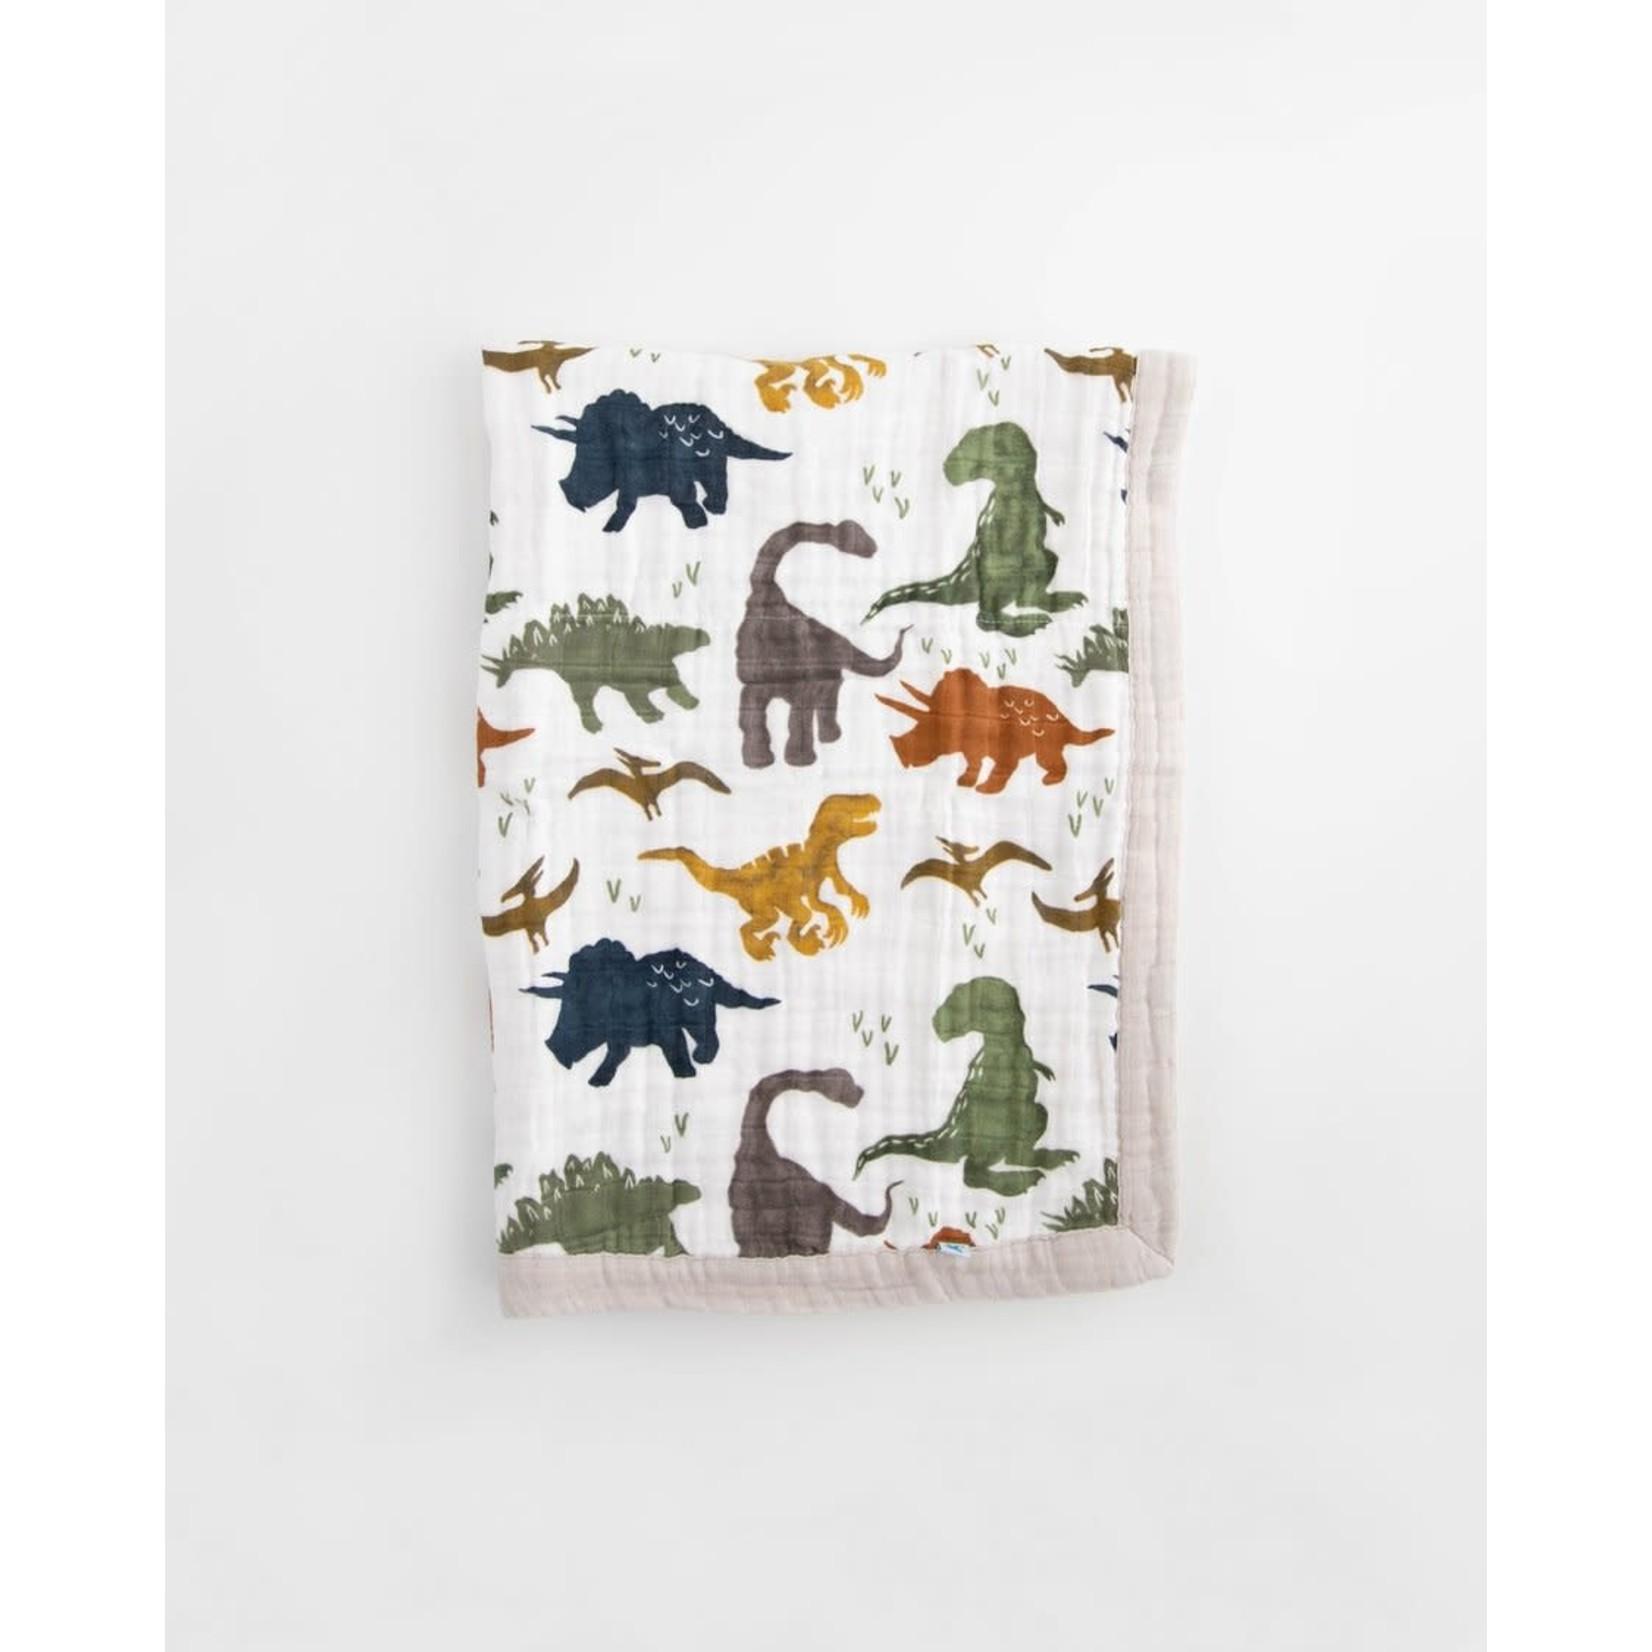 Little Unicorn Cotton Muslin Baby Blanket - Dino Friends